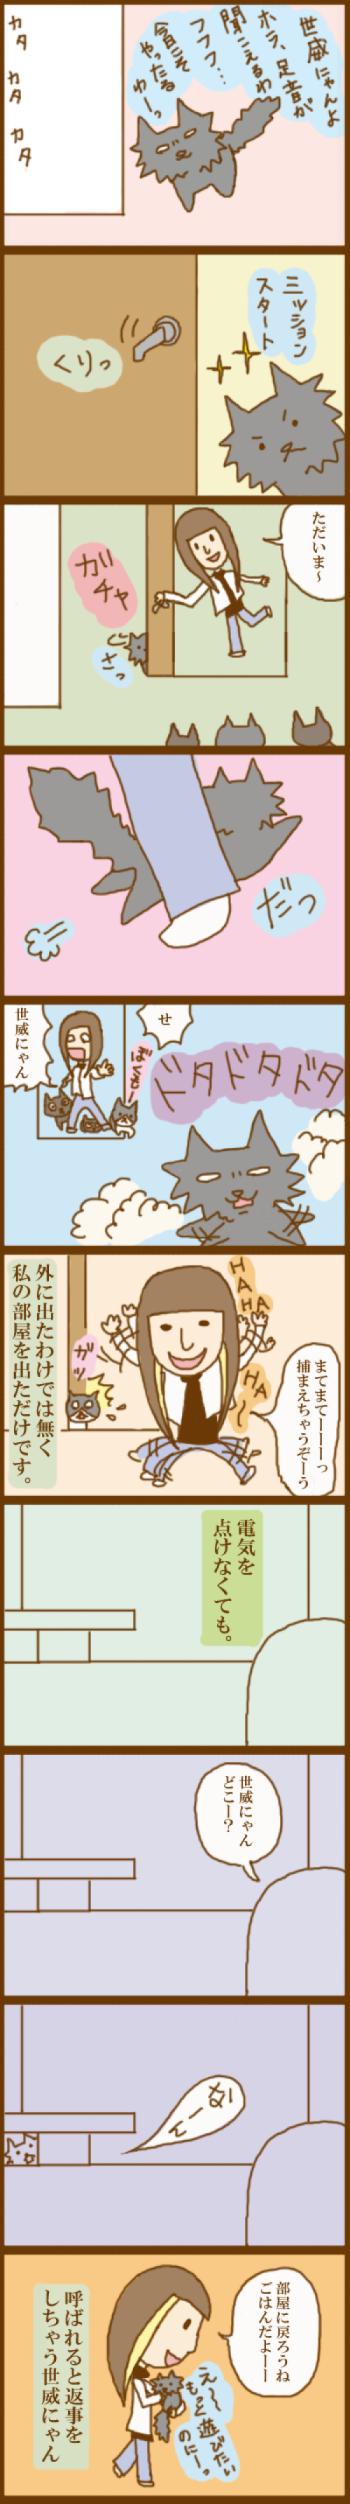 f:id:suzuokayu:20201109092302j:plain